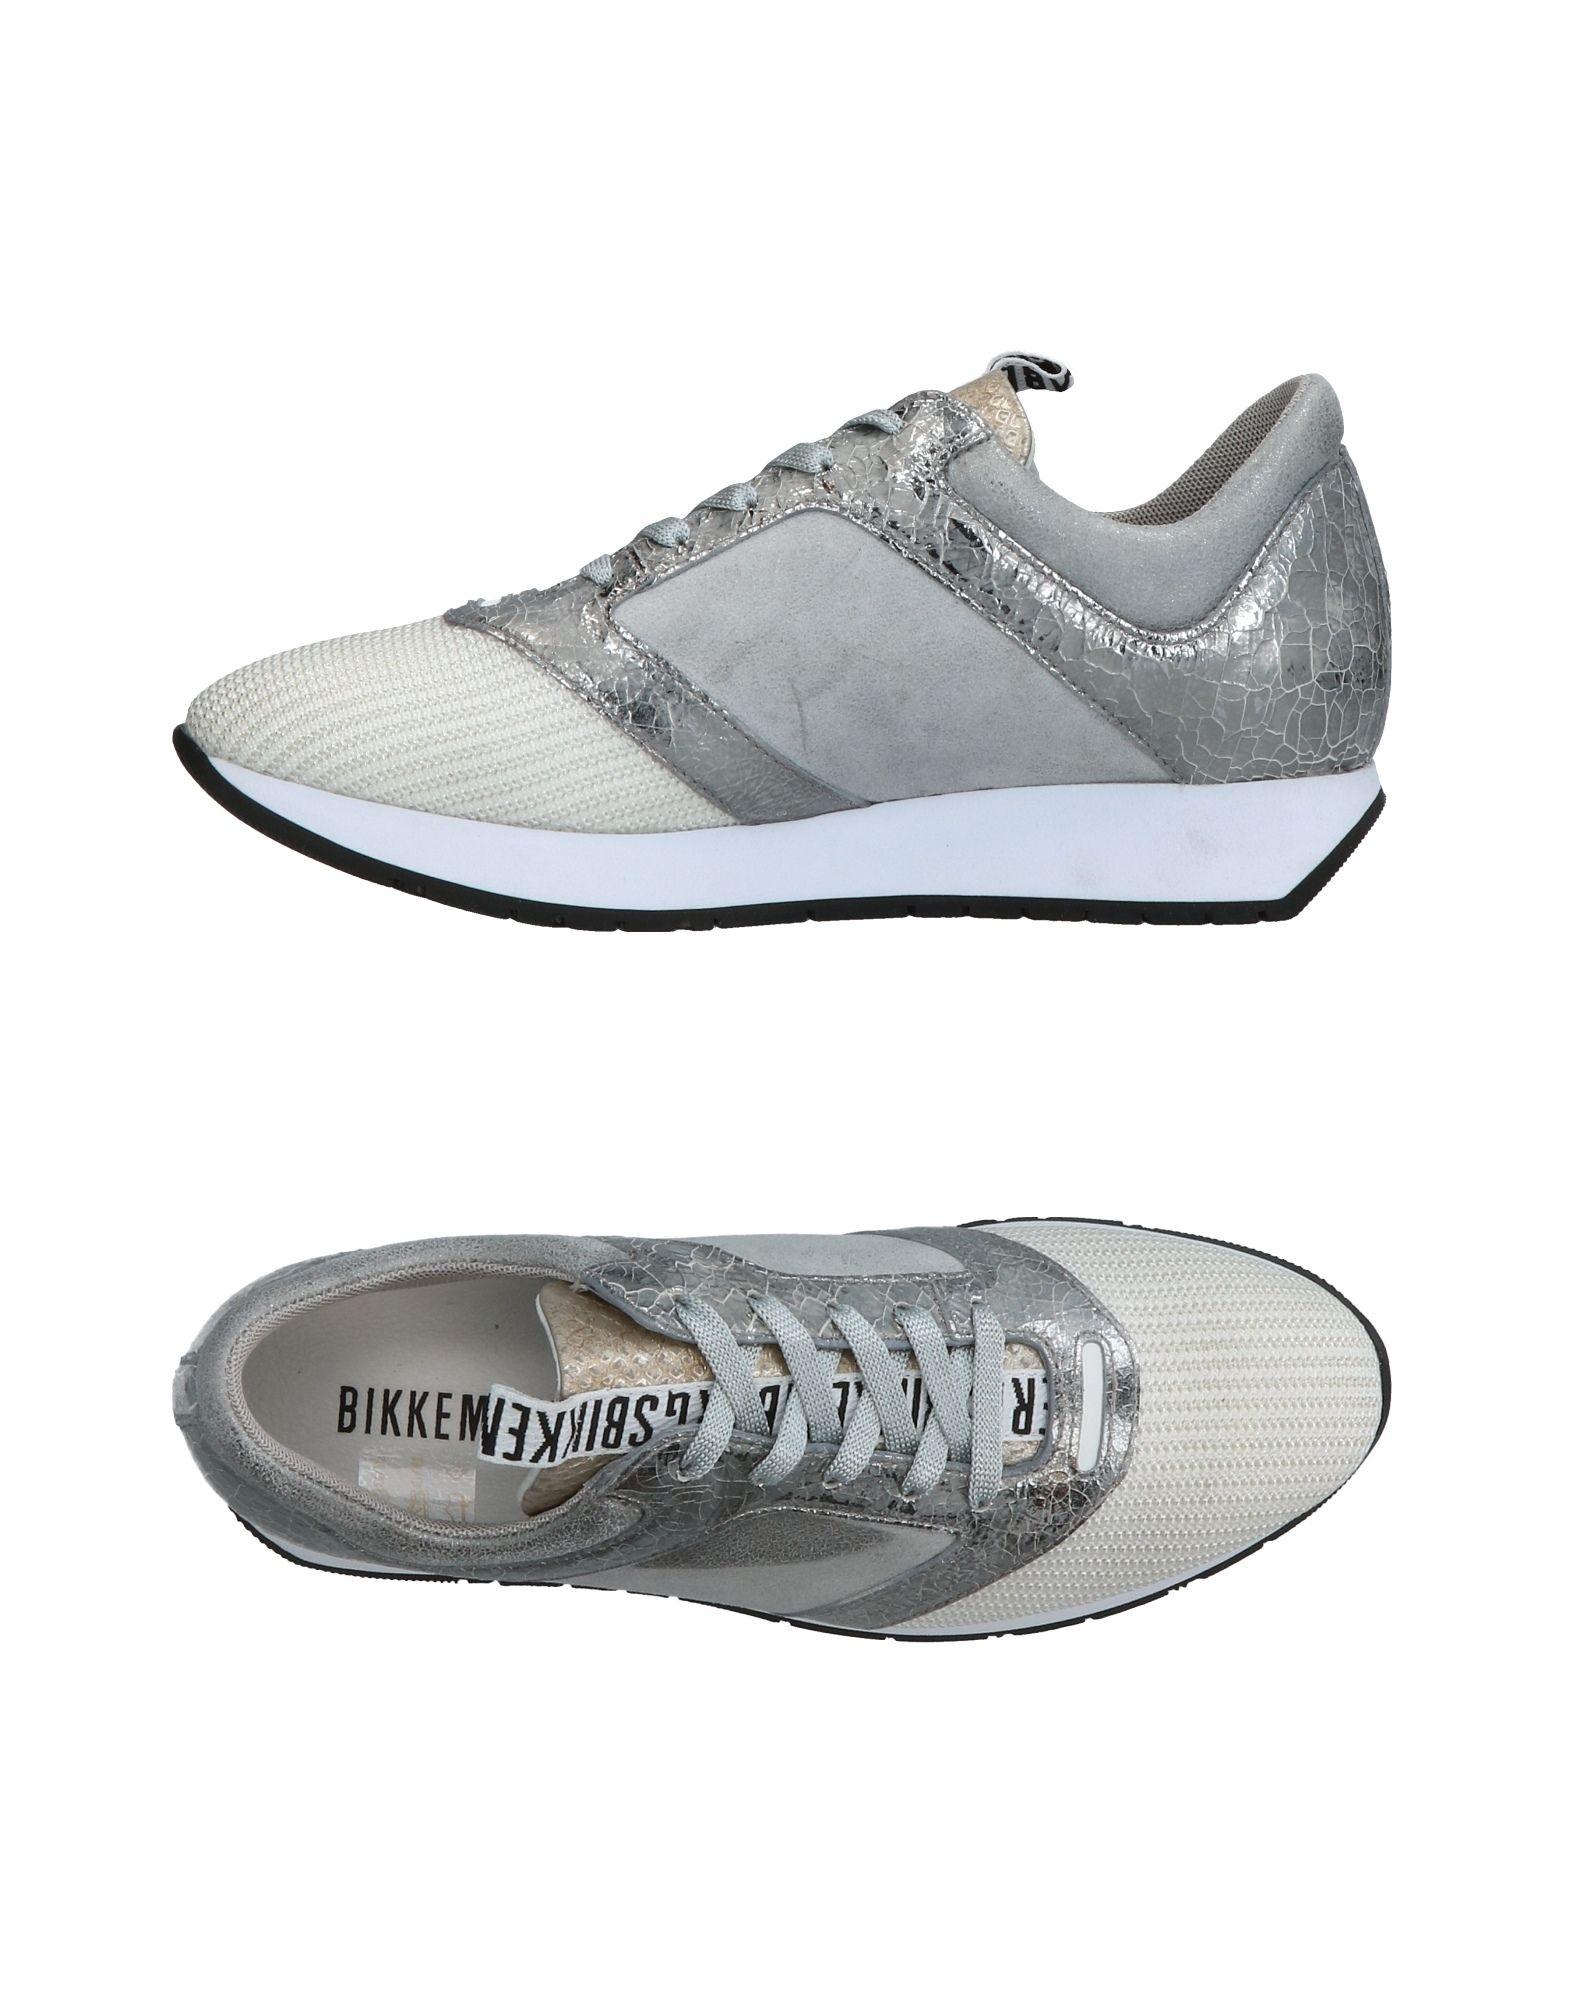 BIKKEMBERGS Damen Low Sneakers & Tennisschuhe Farbe Grau Größe 7 jetztbilligerkaufen